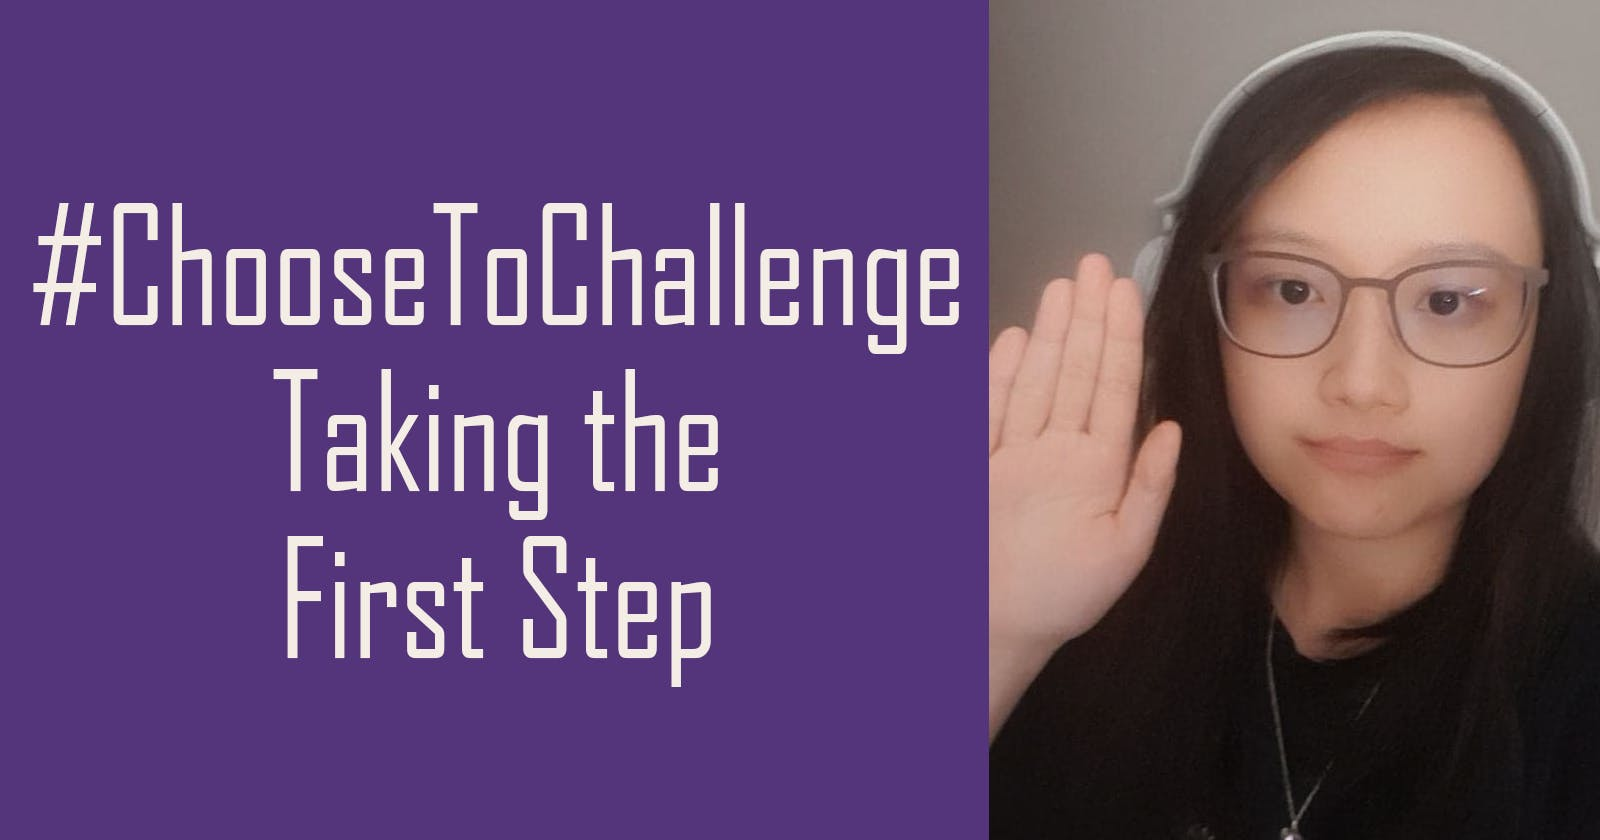 #ChooseToChallenge: Taking the First Step